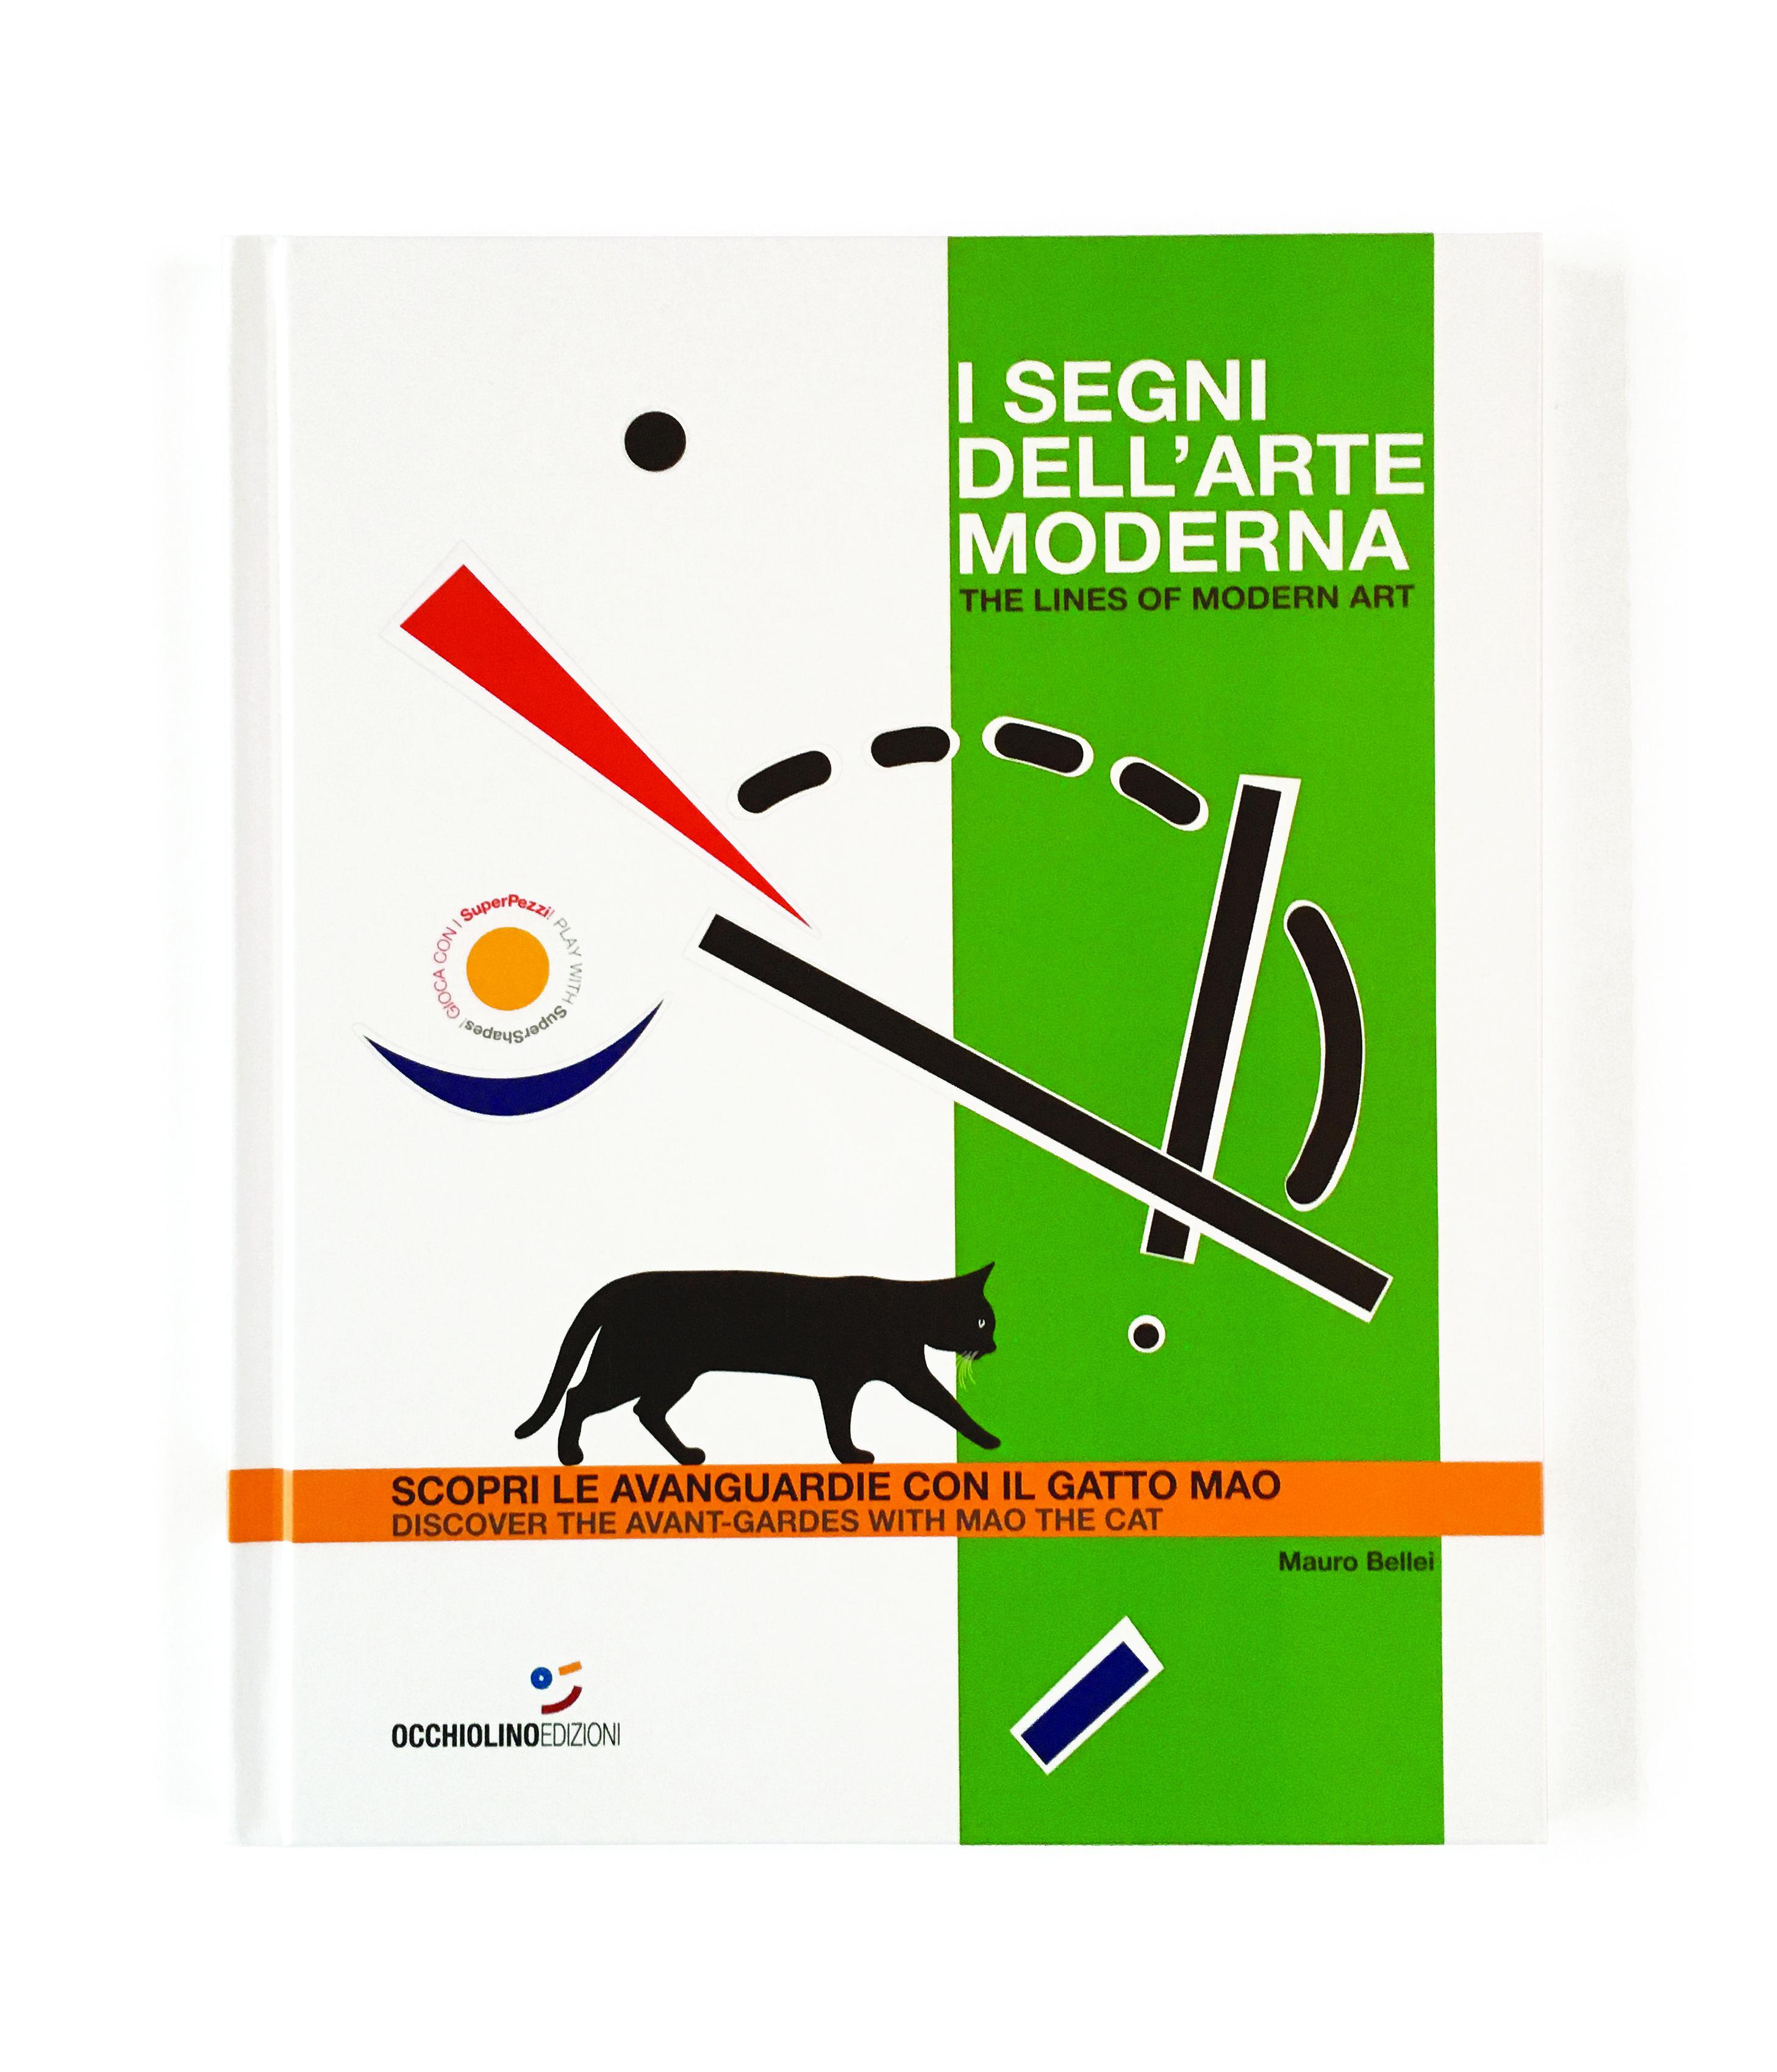 1 - I SEGNI DELL'ARTE MODERNA